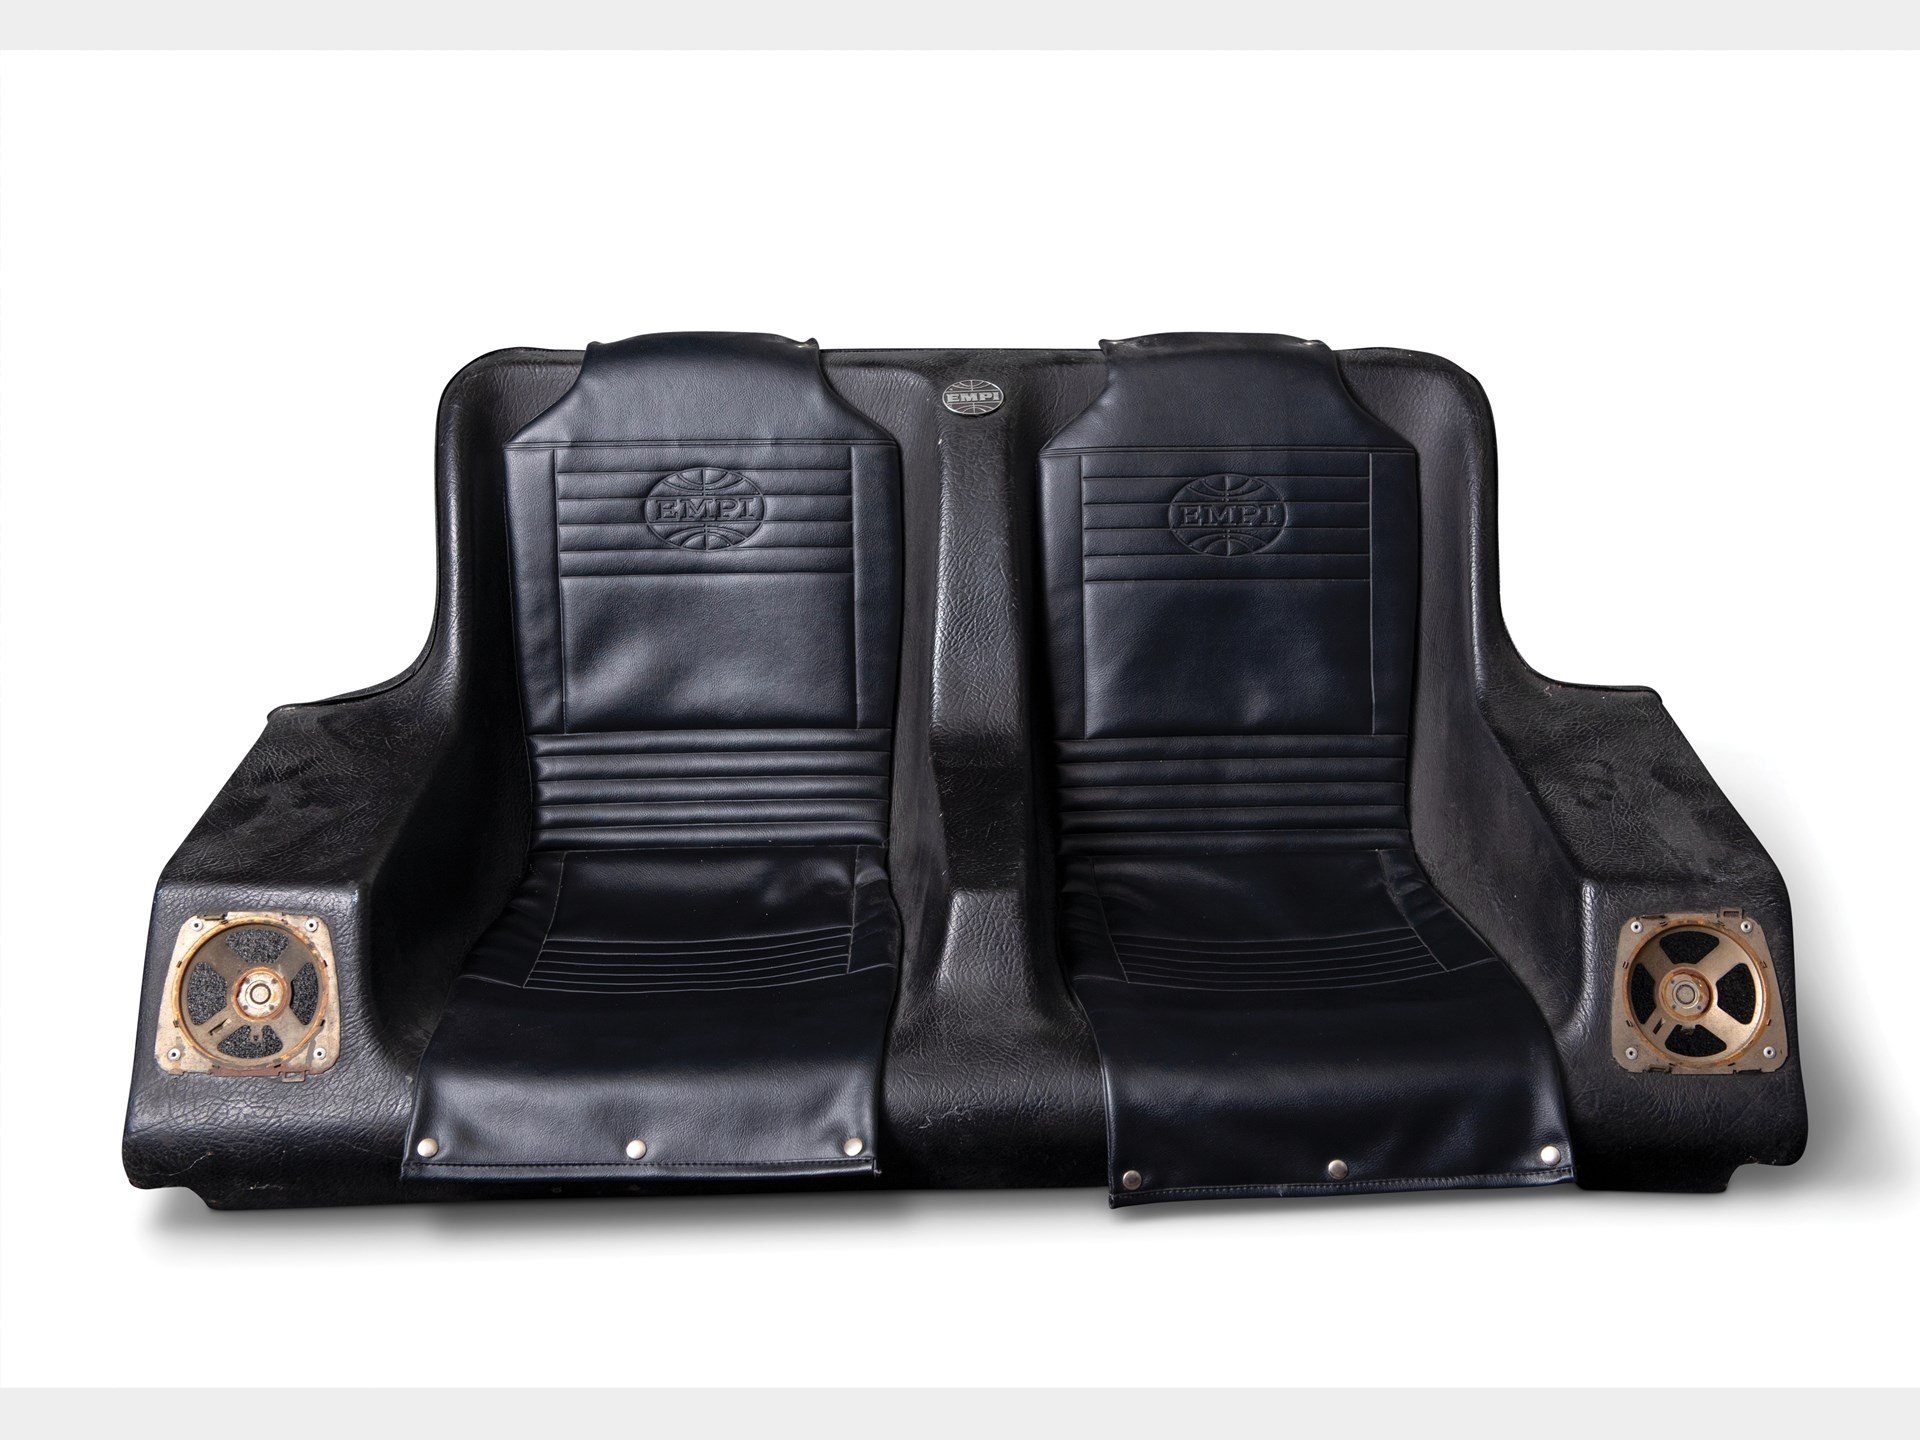 RM Sotheby's - EMPI Rear Seat | The Taj Ma Garaj Collection